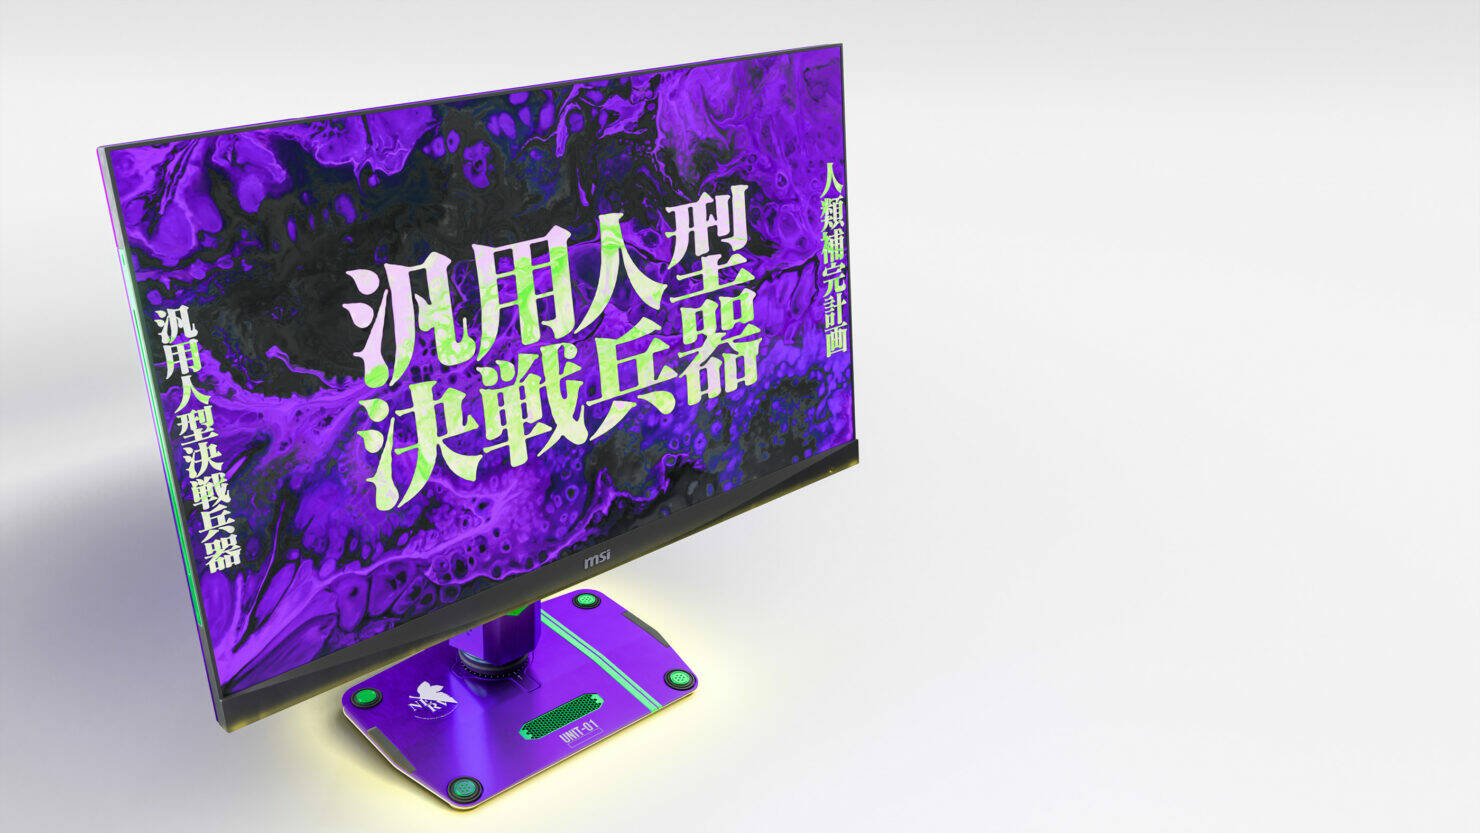 MSI Neon Genesis Evangelion Monitor